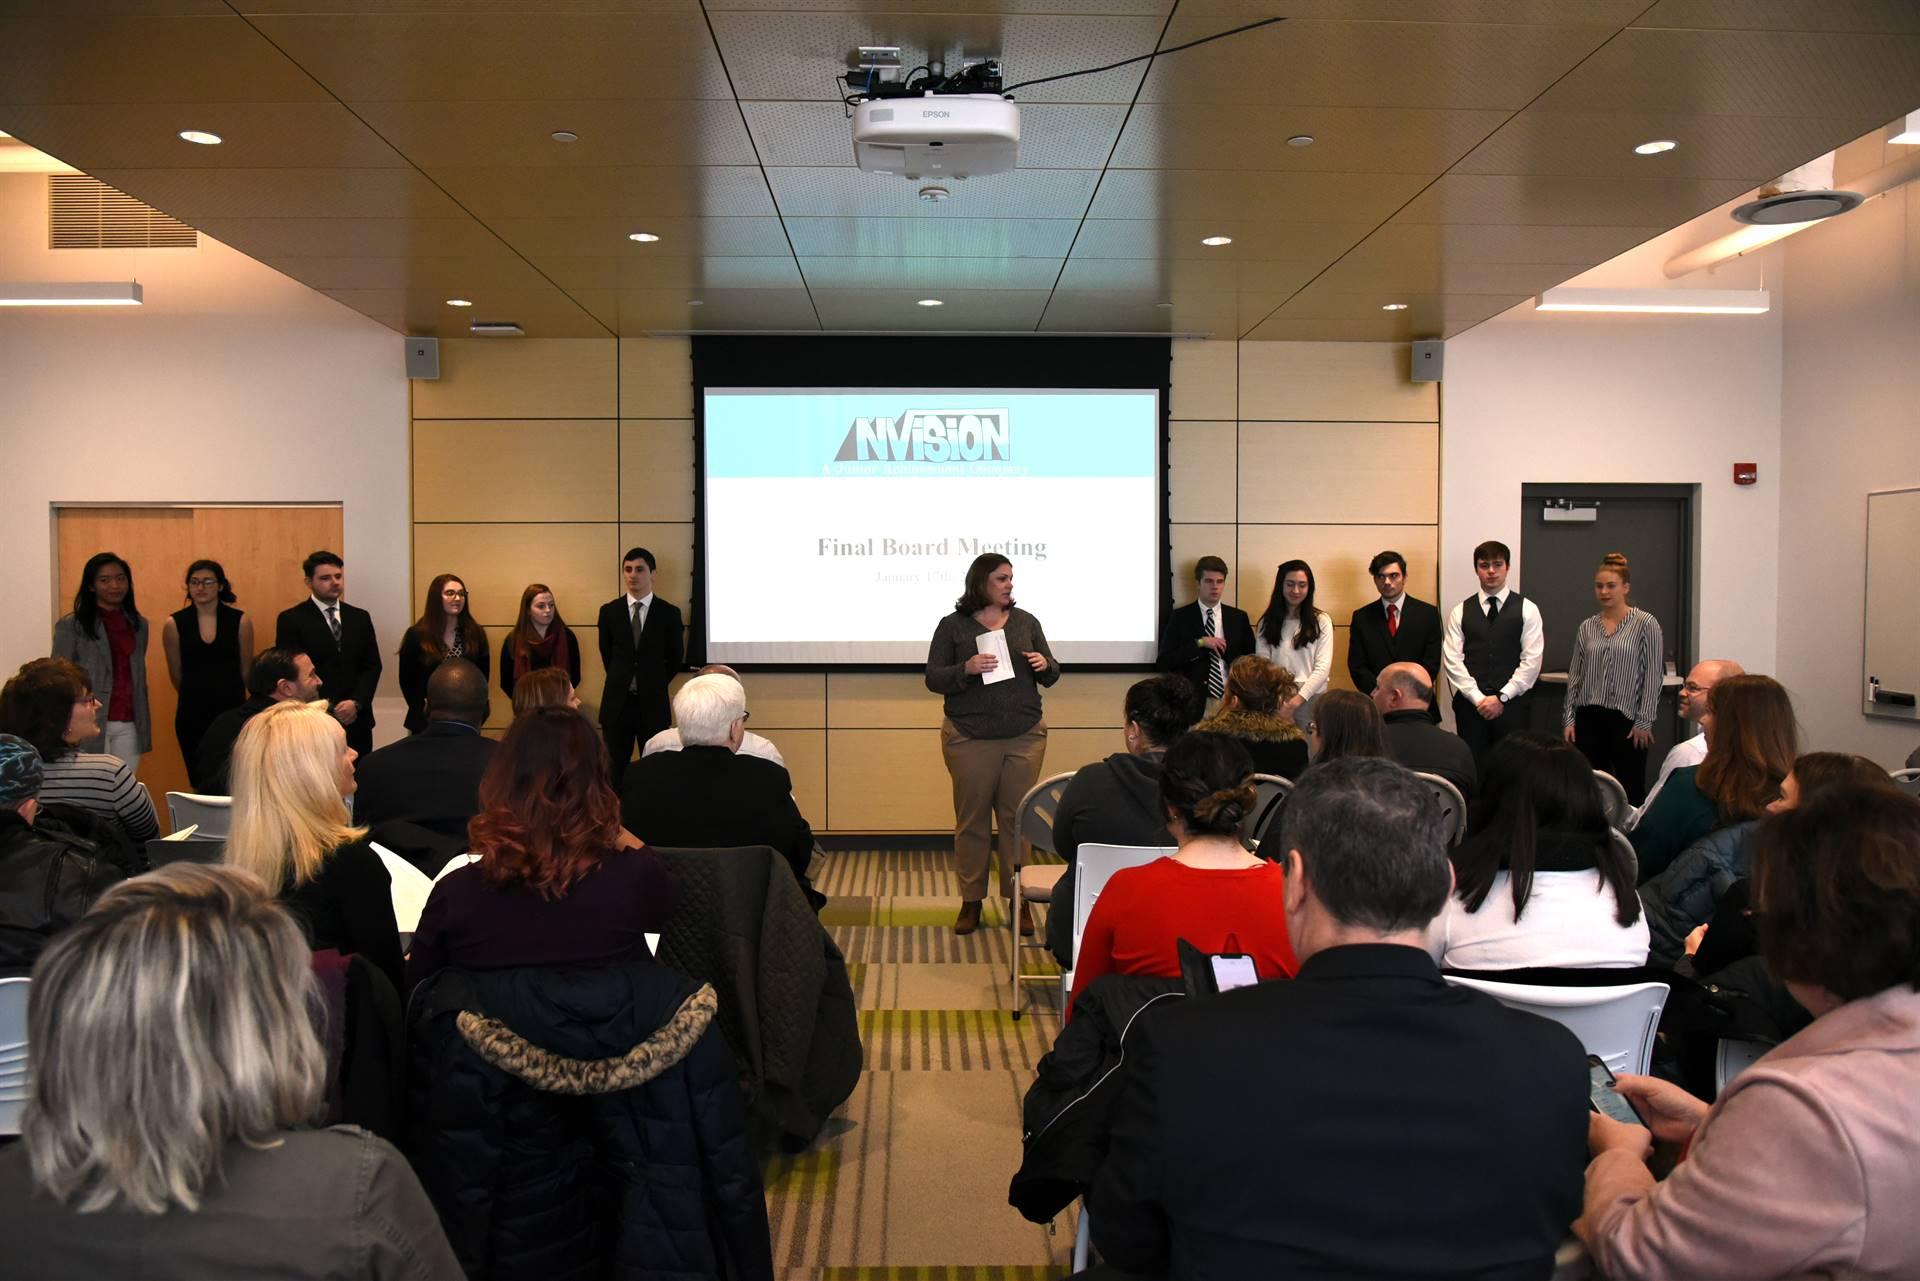 JA presentation